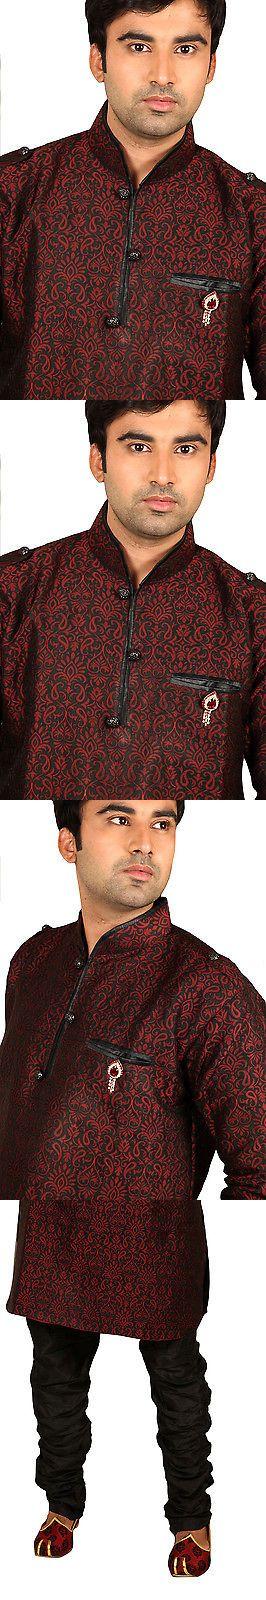 Kurta 155248: Stylish Maroon Silk Indian Kurta Pajama Sherwani For Men -> BUY IT NOW ONLY: $199 on eBay!